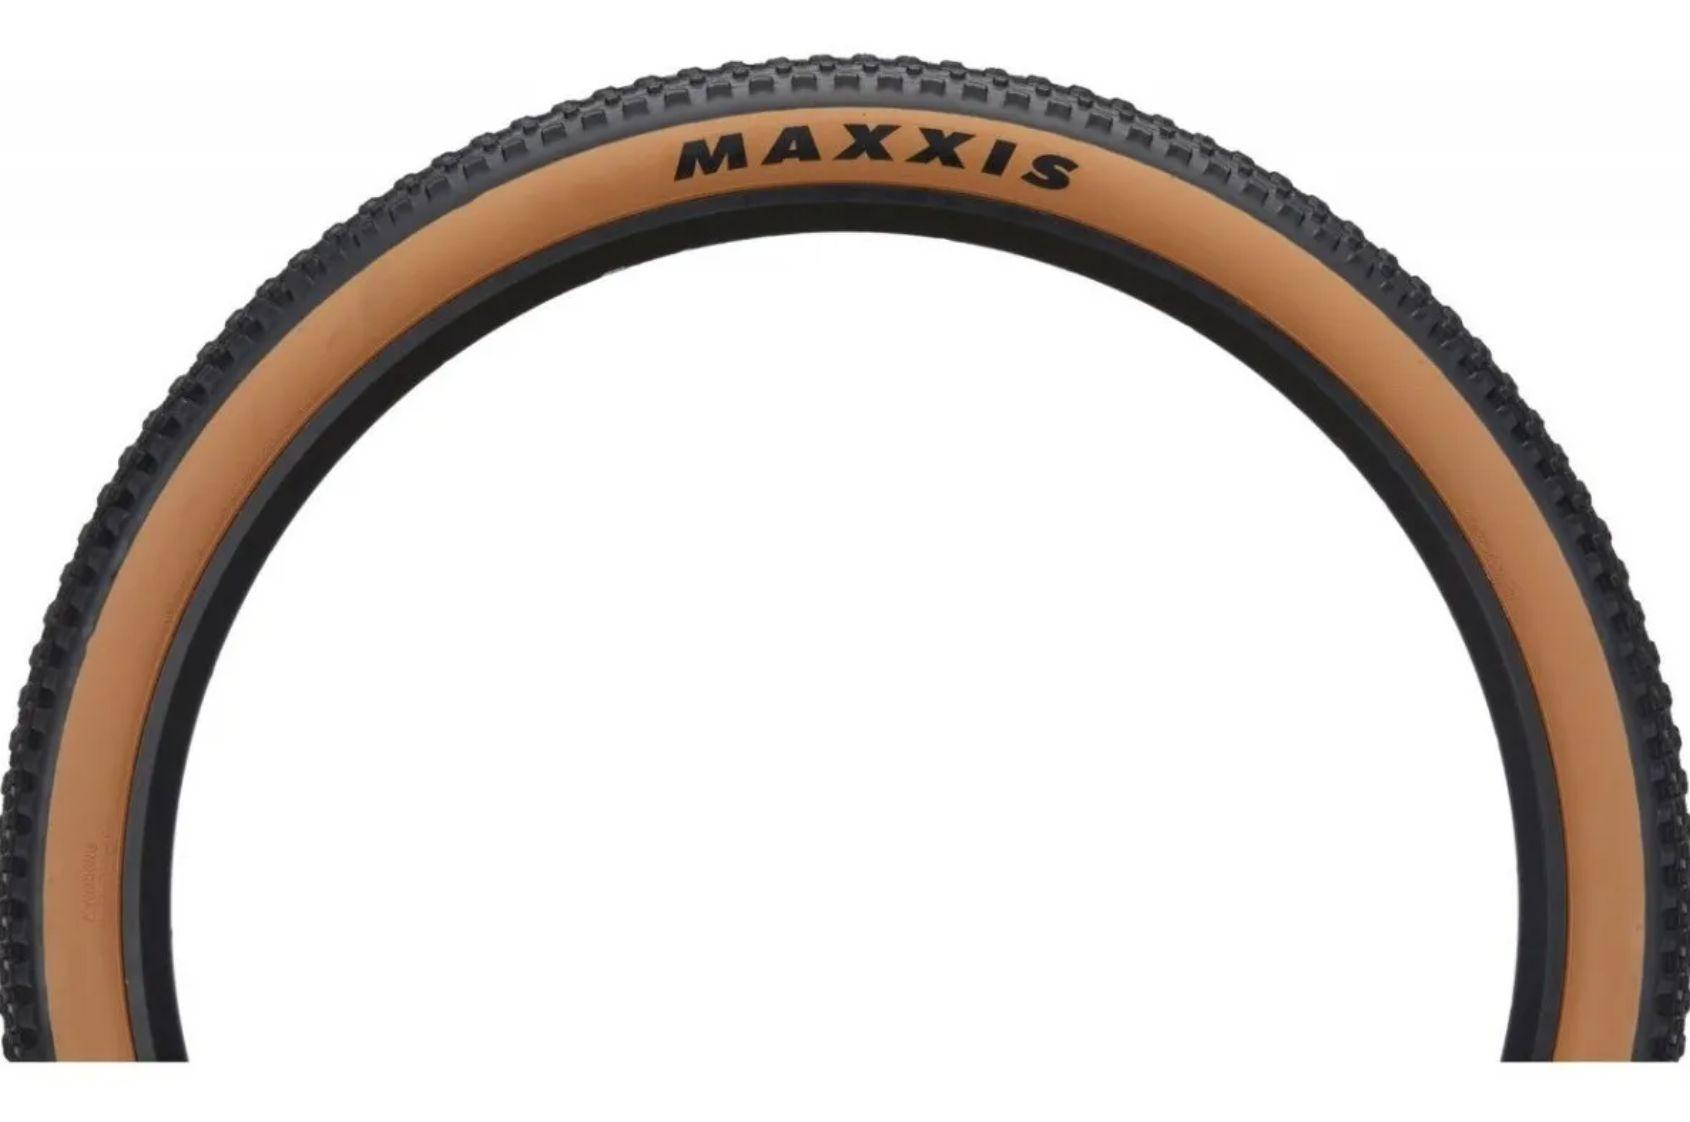 Par Pneus Maxxis 29x2.2 Ikon 3c Maxxspeed Exo Protection